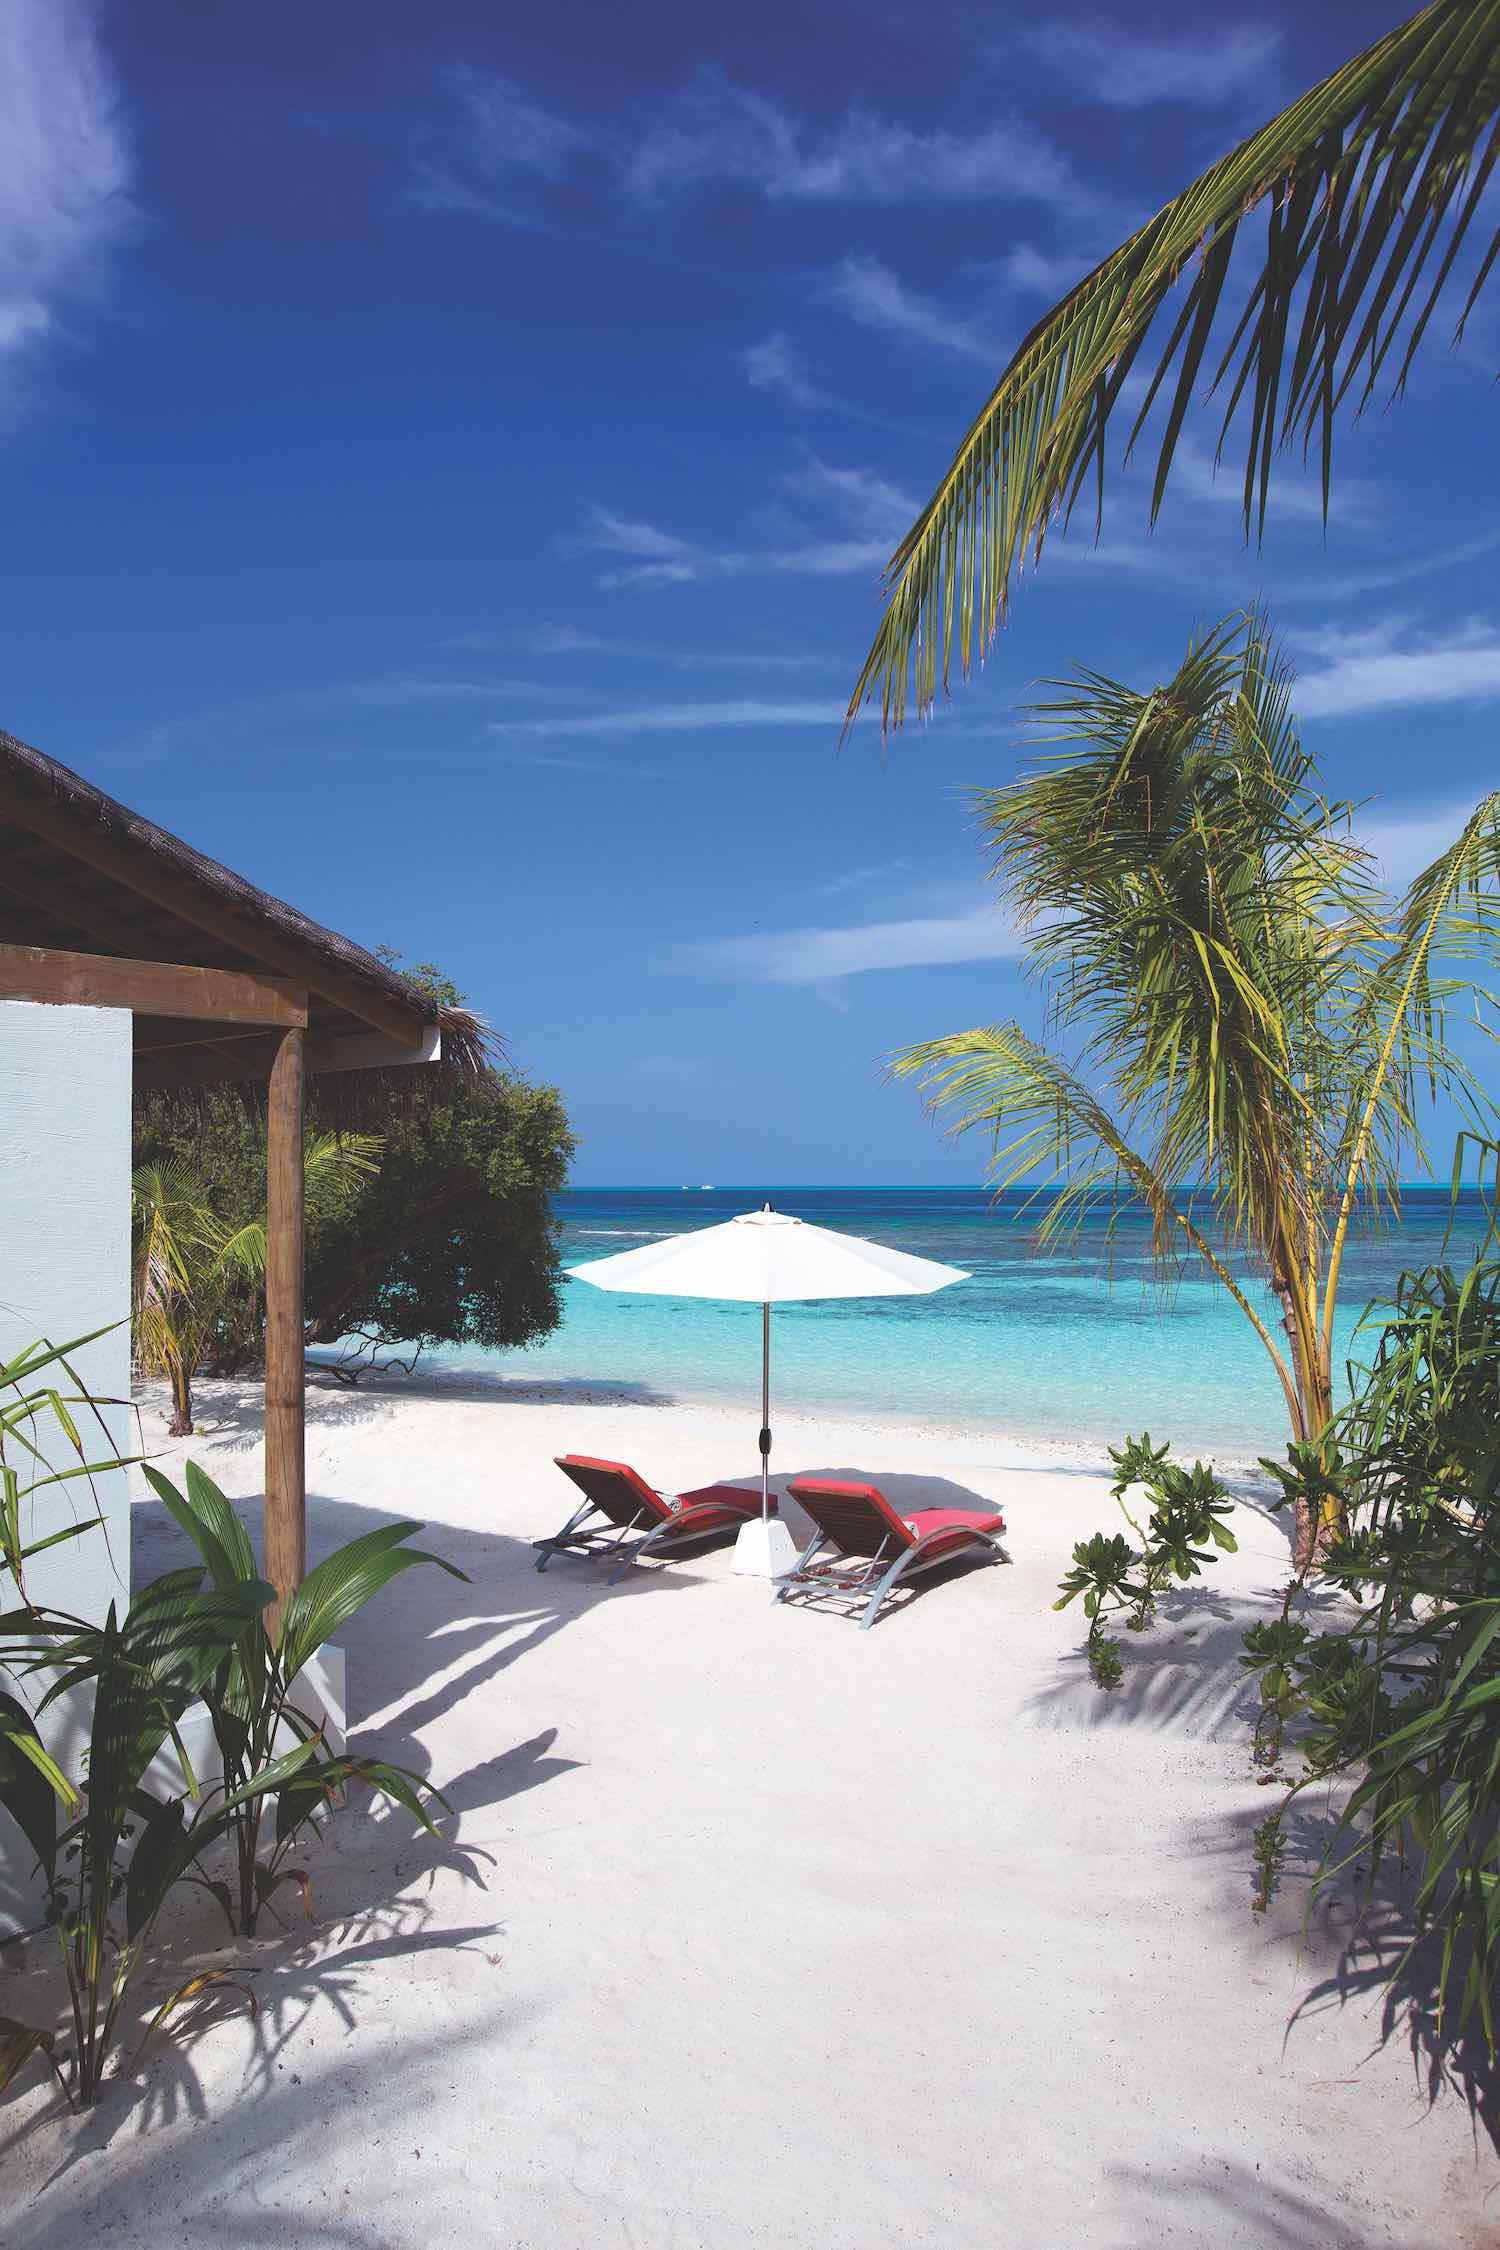 maldives-oblu-by-atmosphere-at-helengeli-deluxe-beach-villa-3-holiday-honeymoon-vacation-invite-to-paradise.jpg